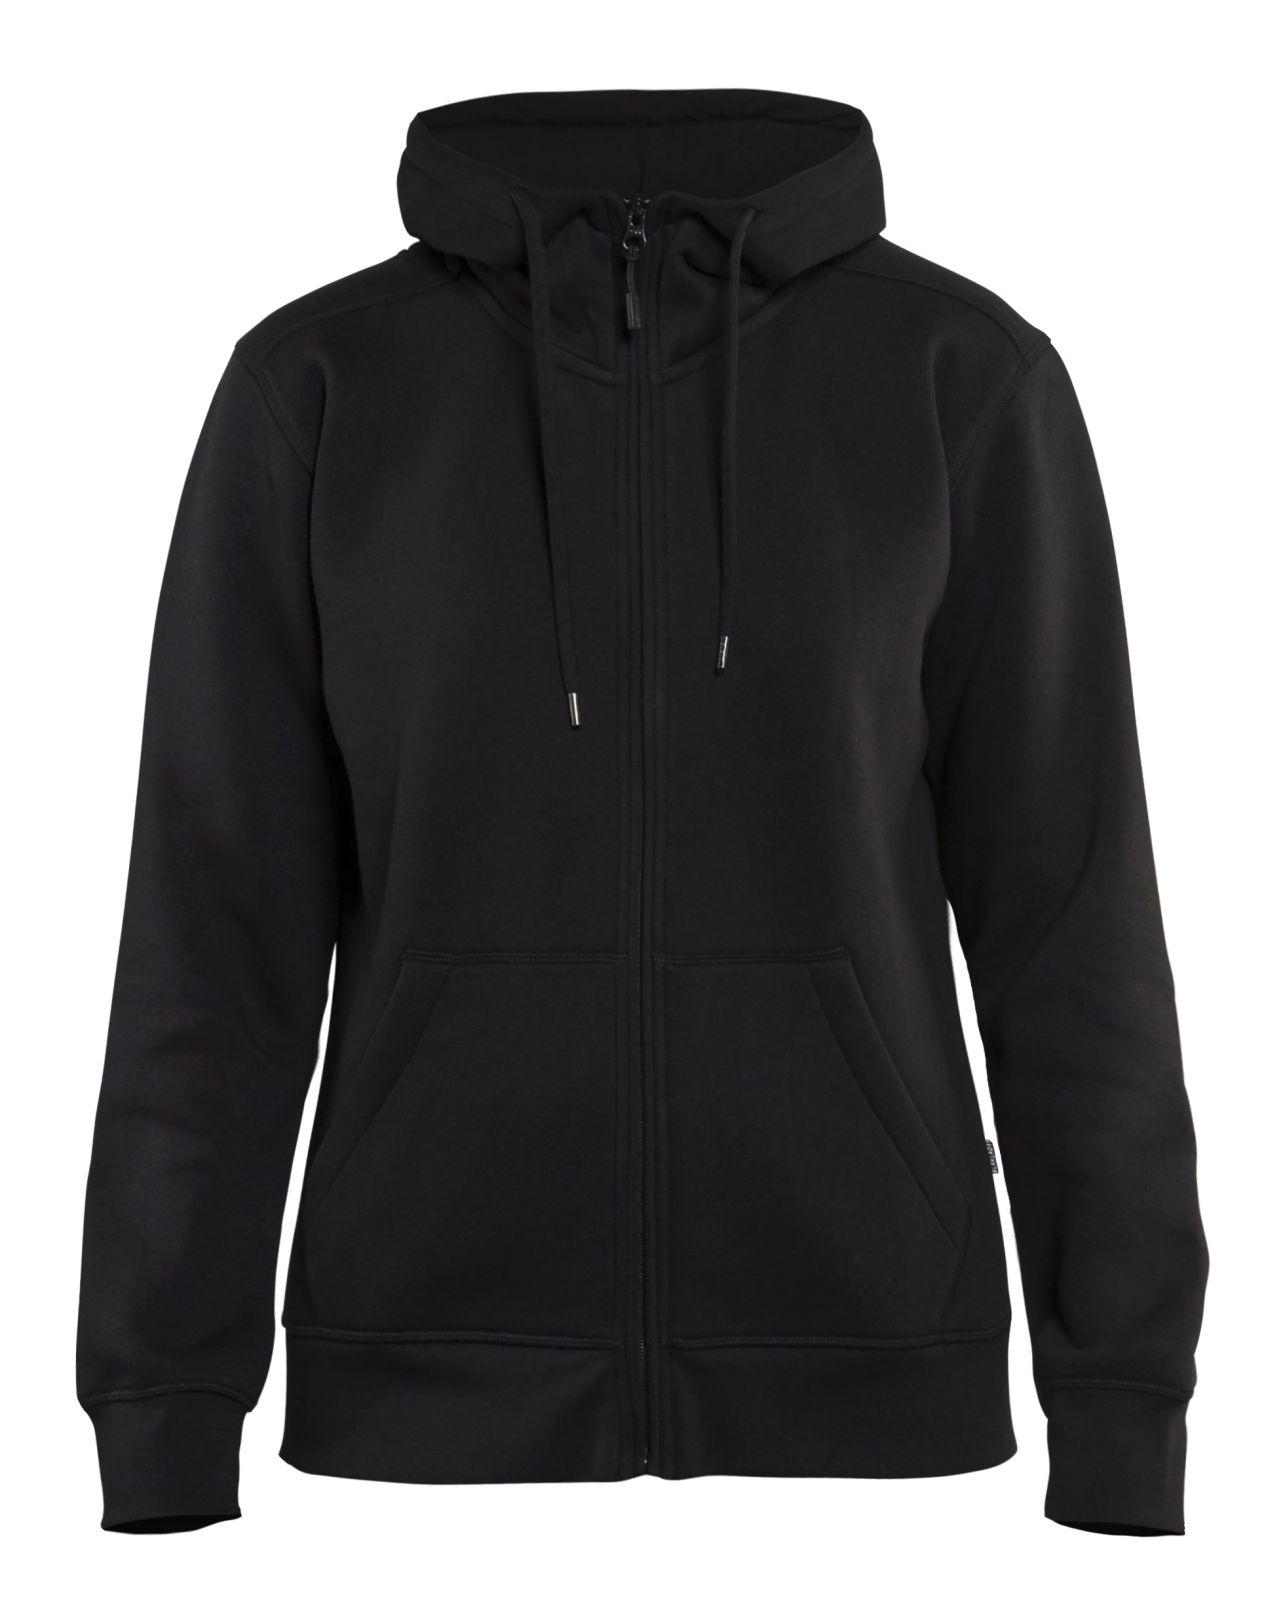 Blaklader Dames hooded sweatvesten 33951048 zwart(9900)